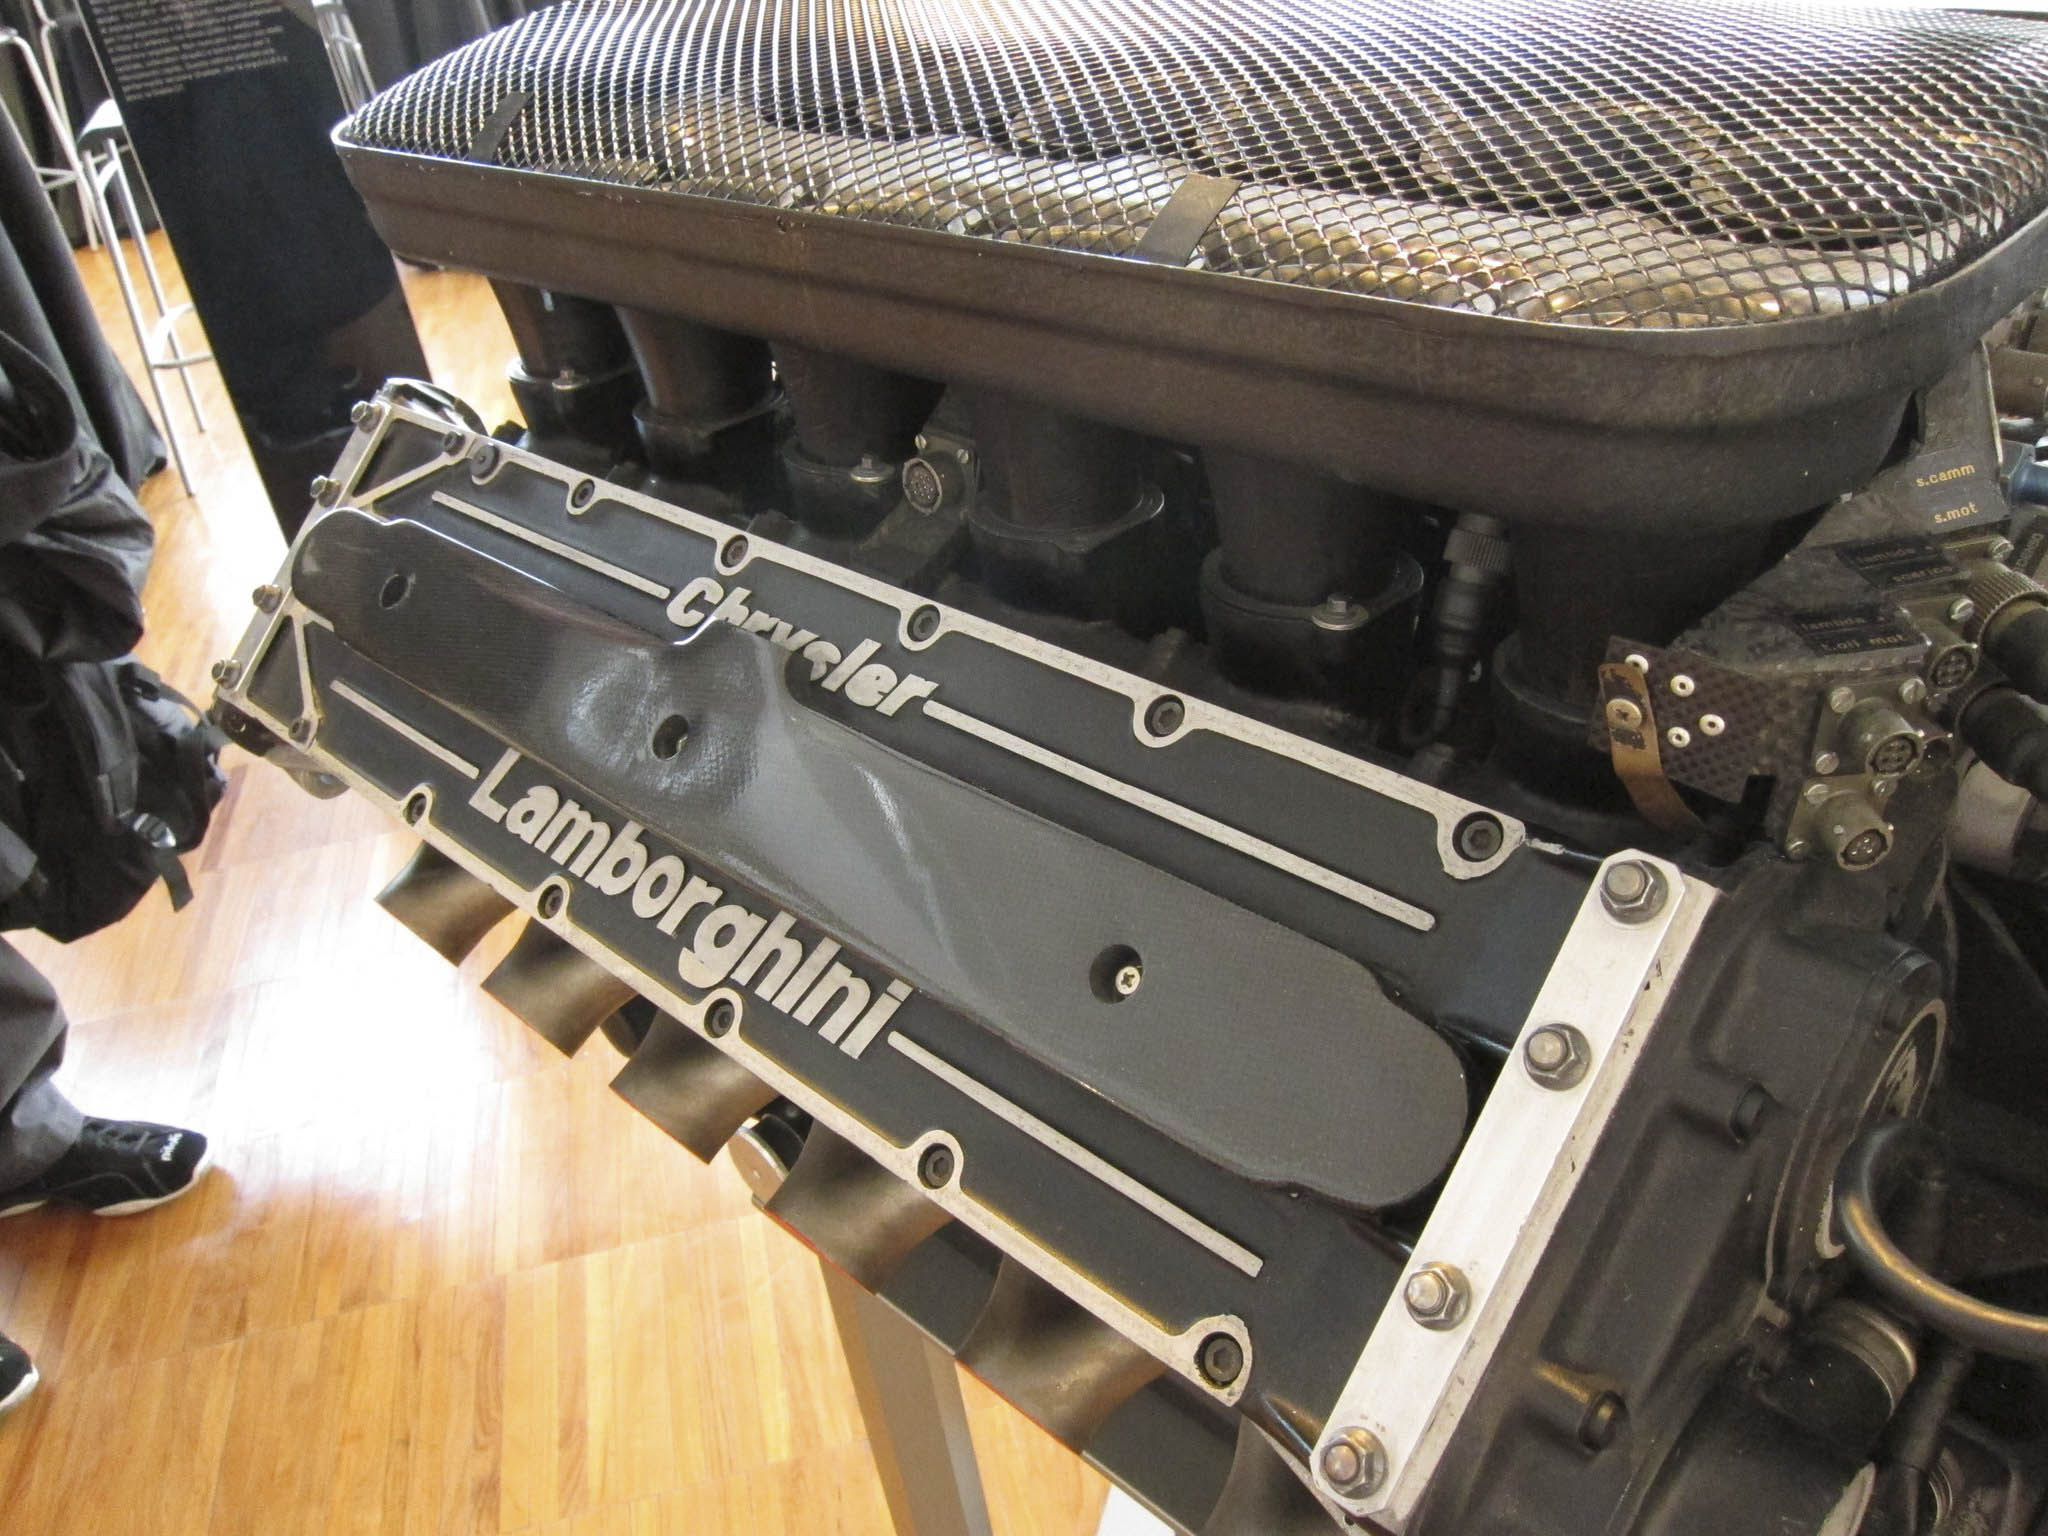 Lamborghini Chrysler engine